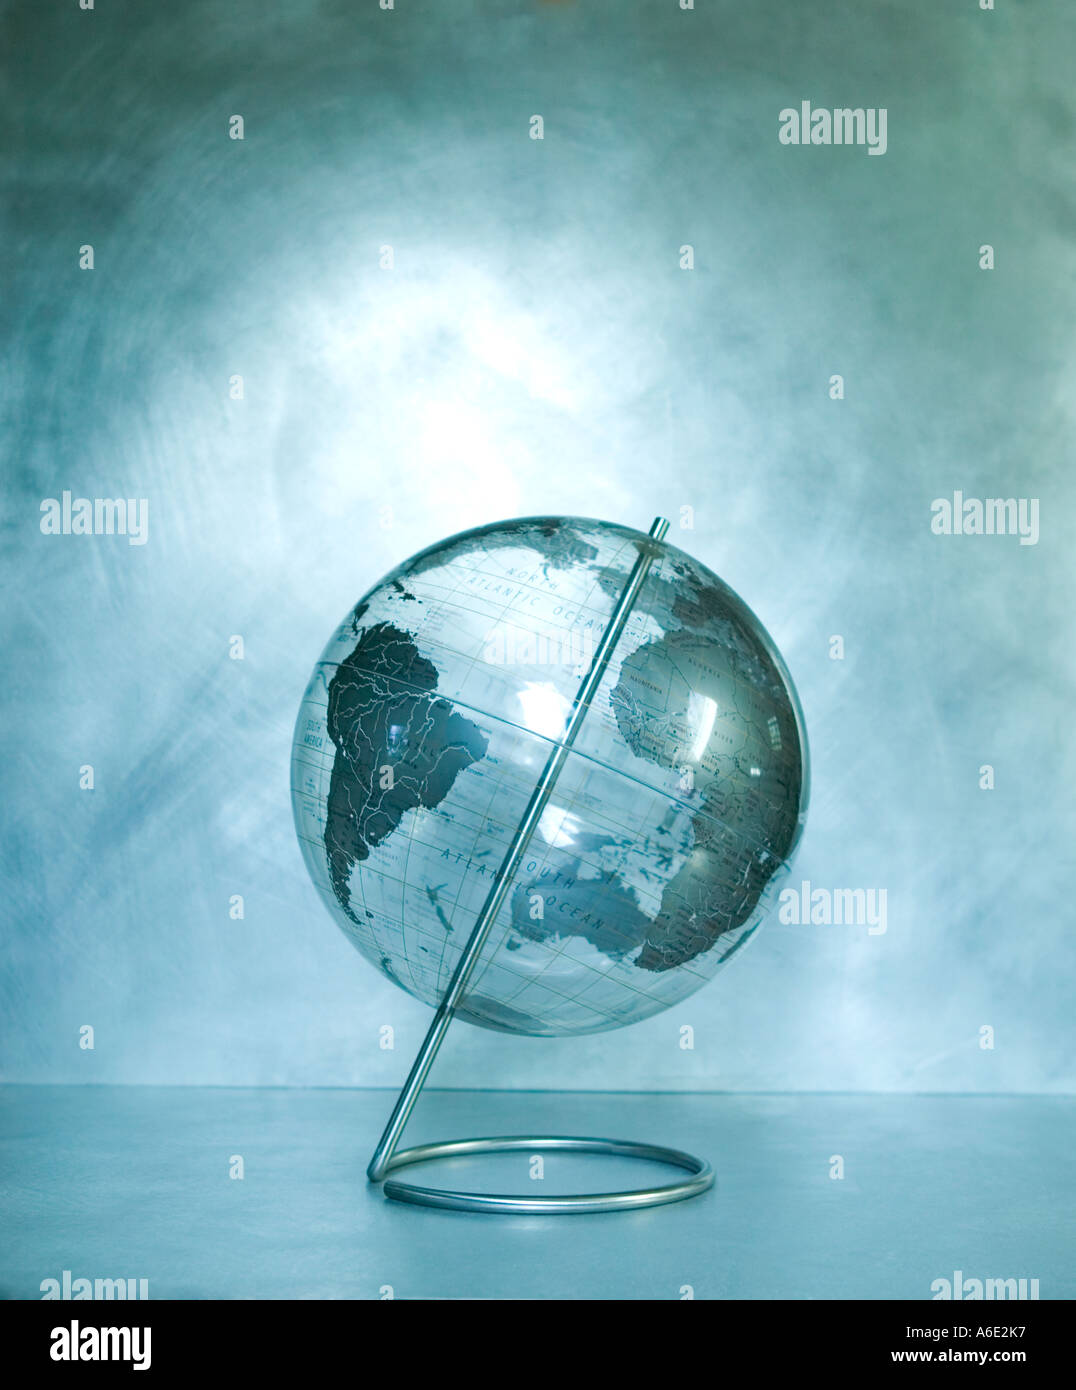 Clear Plastic World Globe on brushed Steel Background Stock Photo